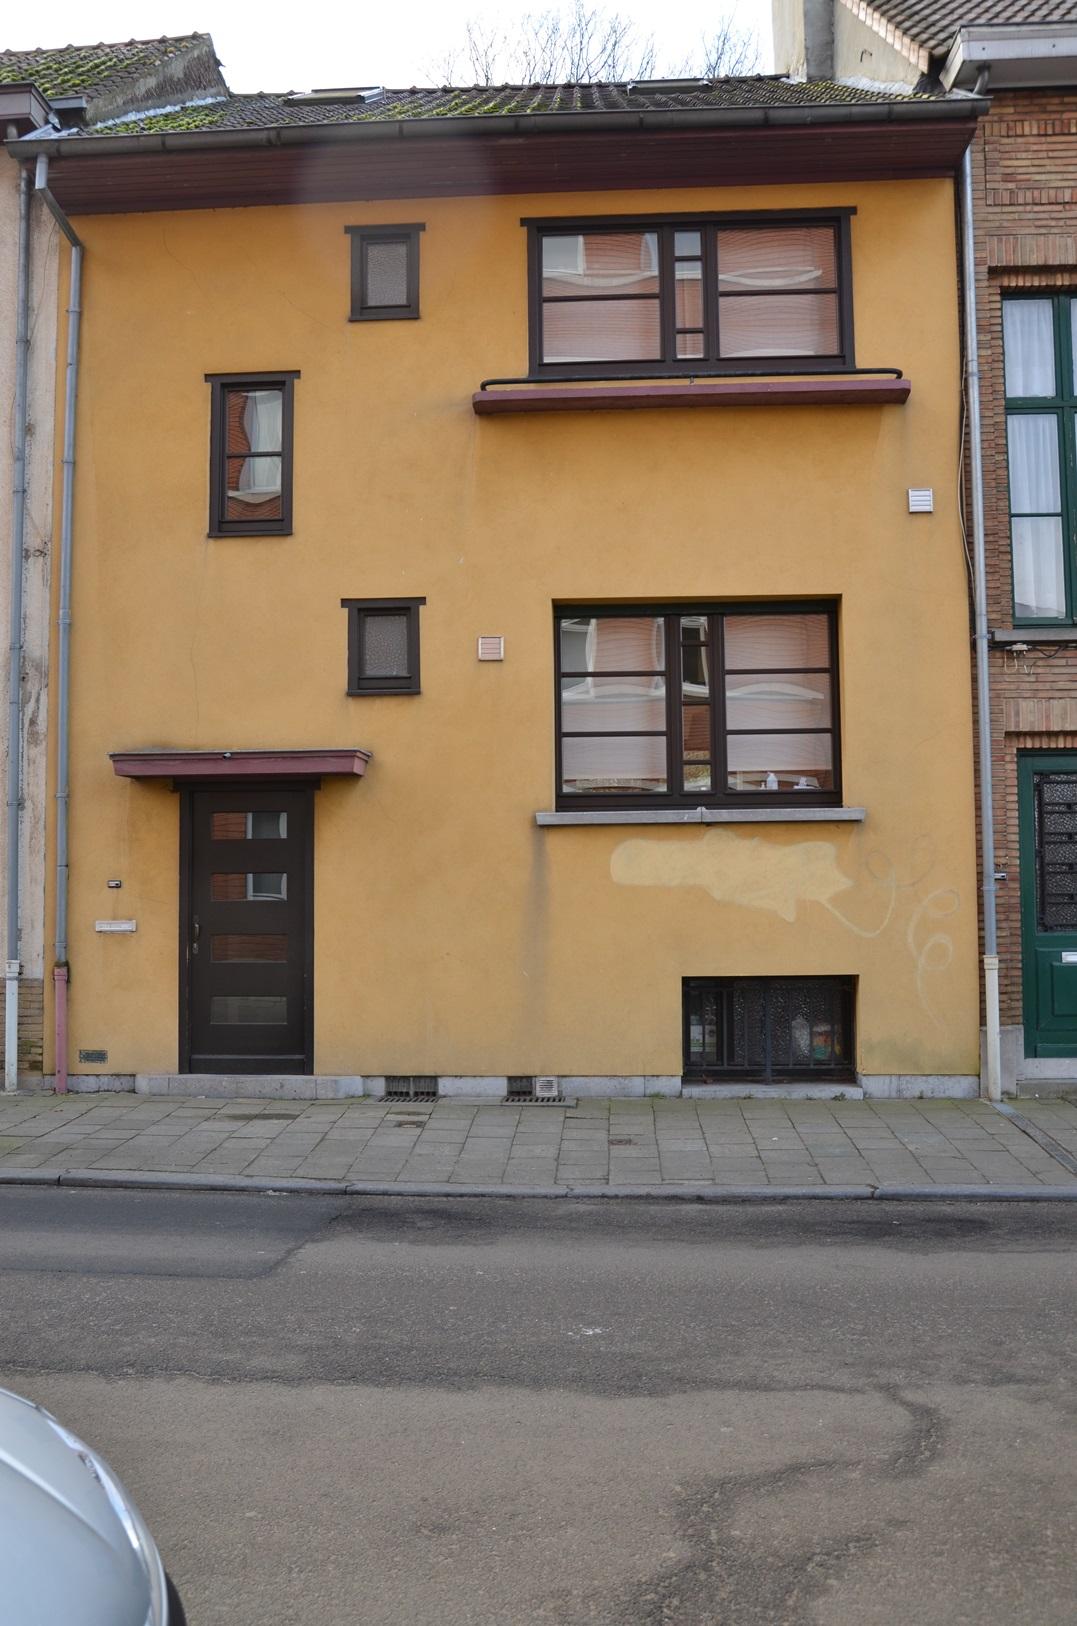 Rue Klipveld 67